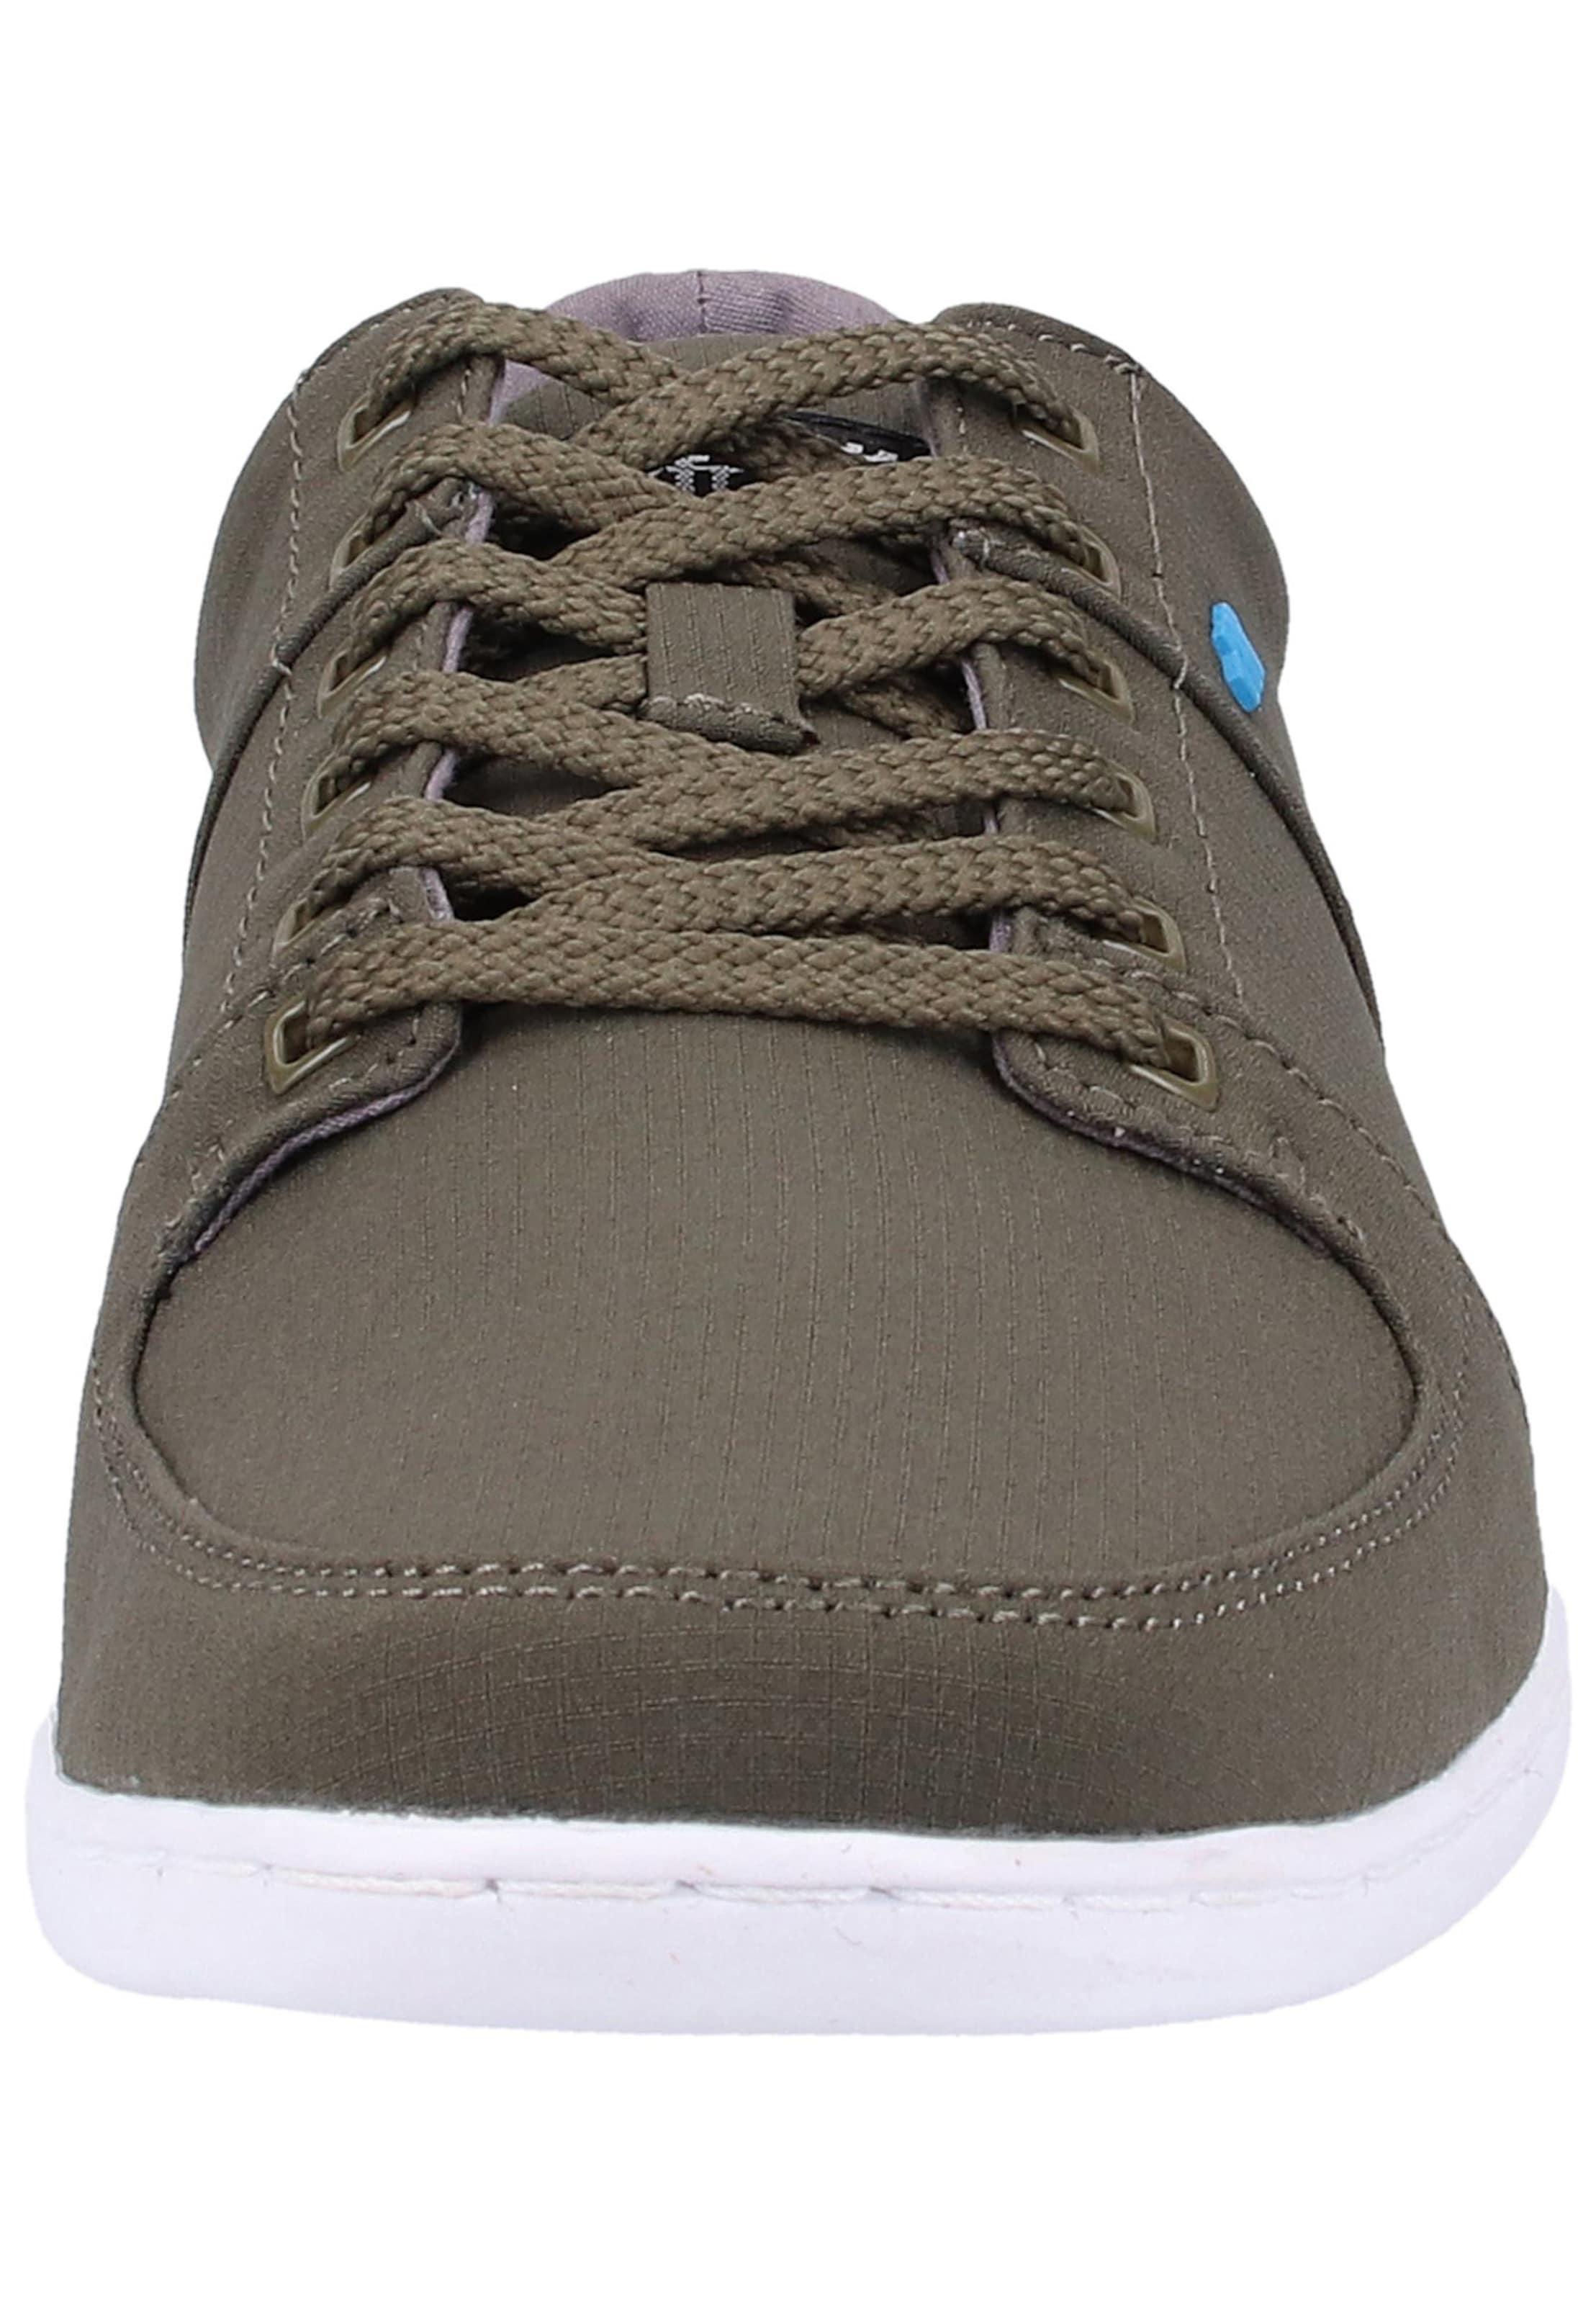 'spencer' Boxfresh Boxfresh Sneaker BraunKhaki Sneaker In YfgIb6yv7